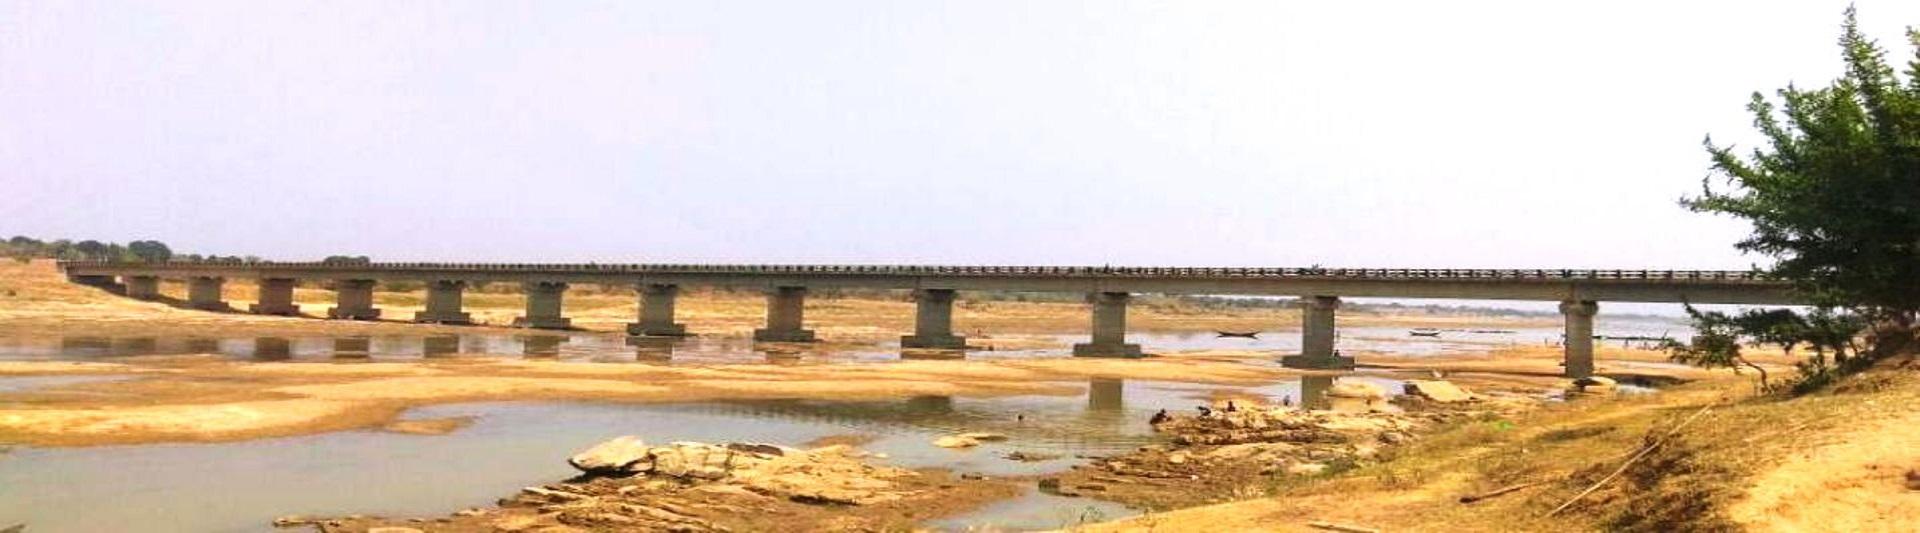 ajay bridge